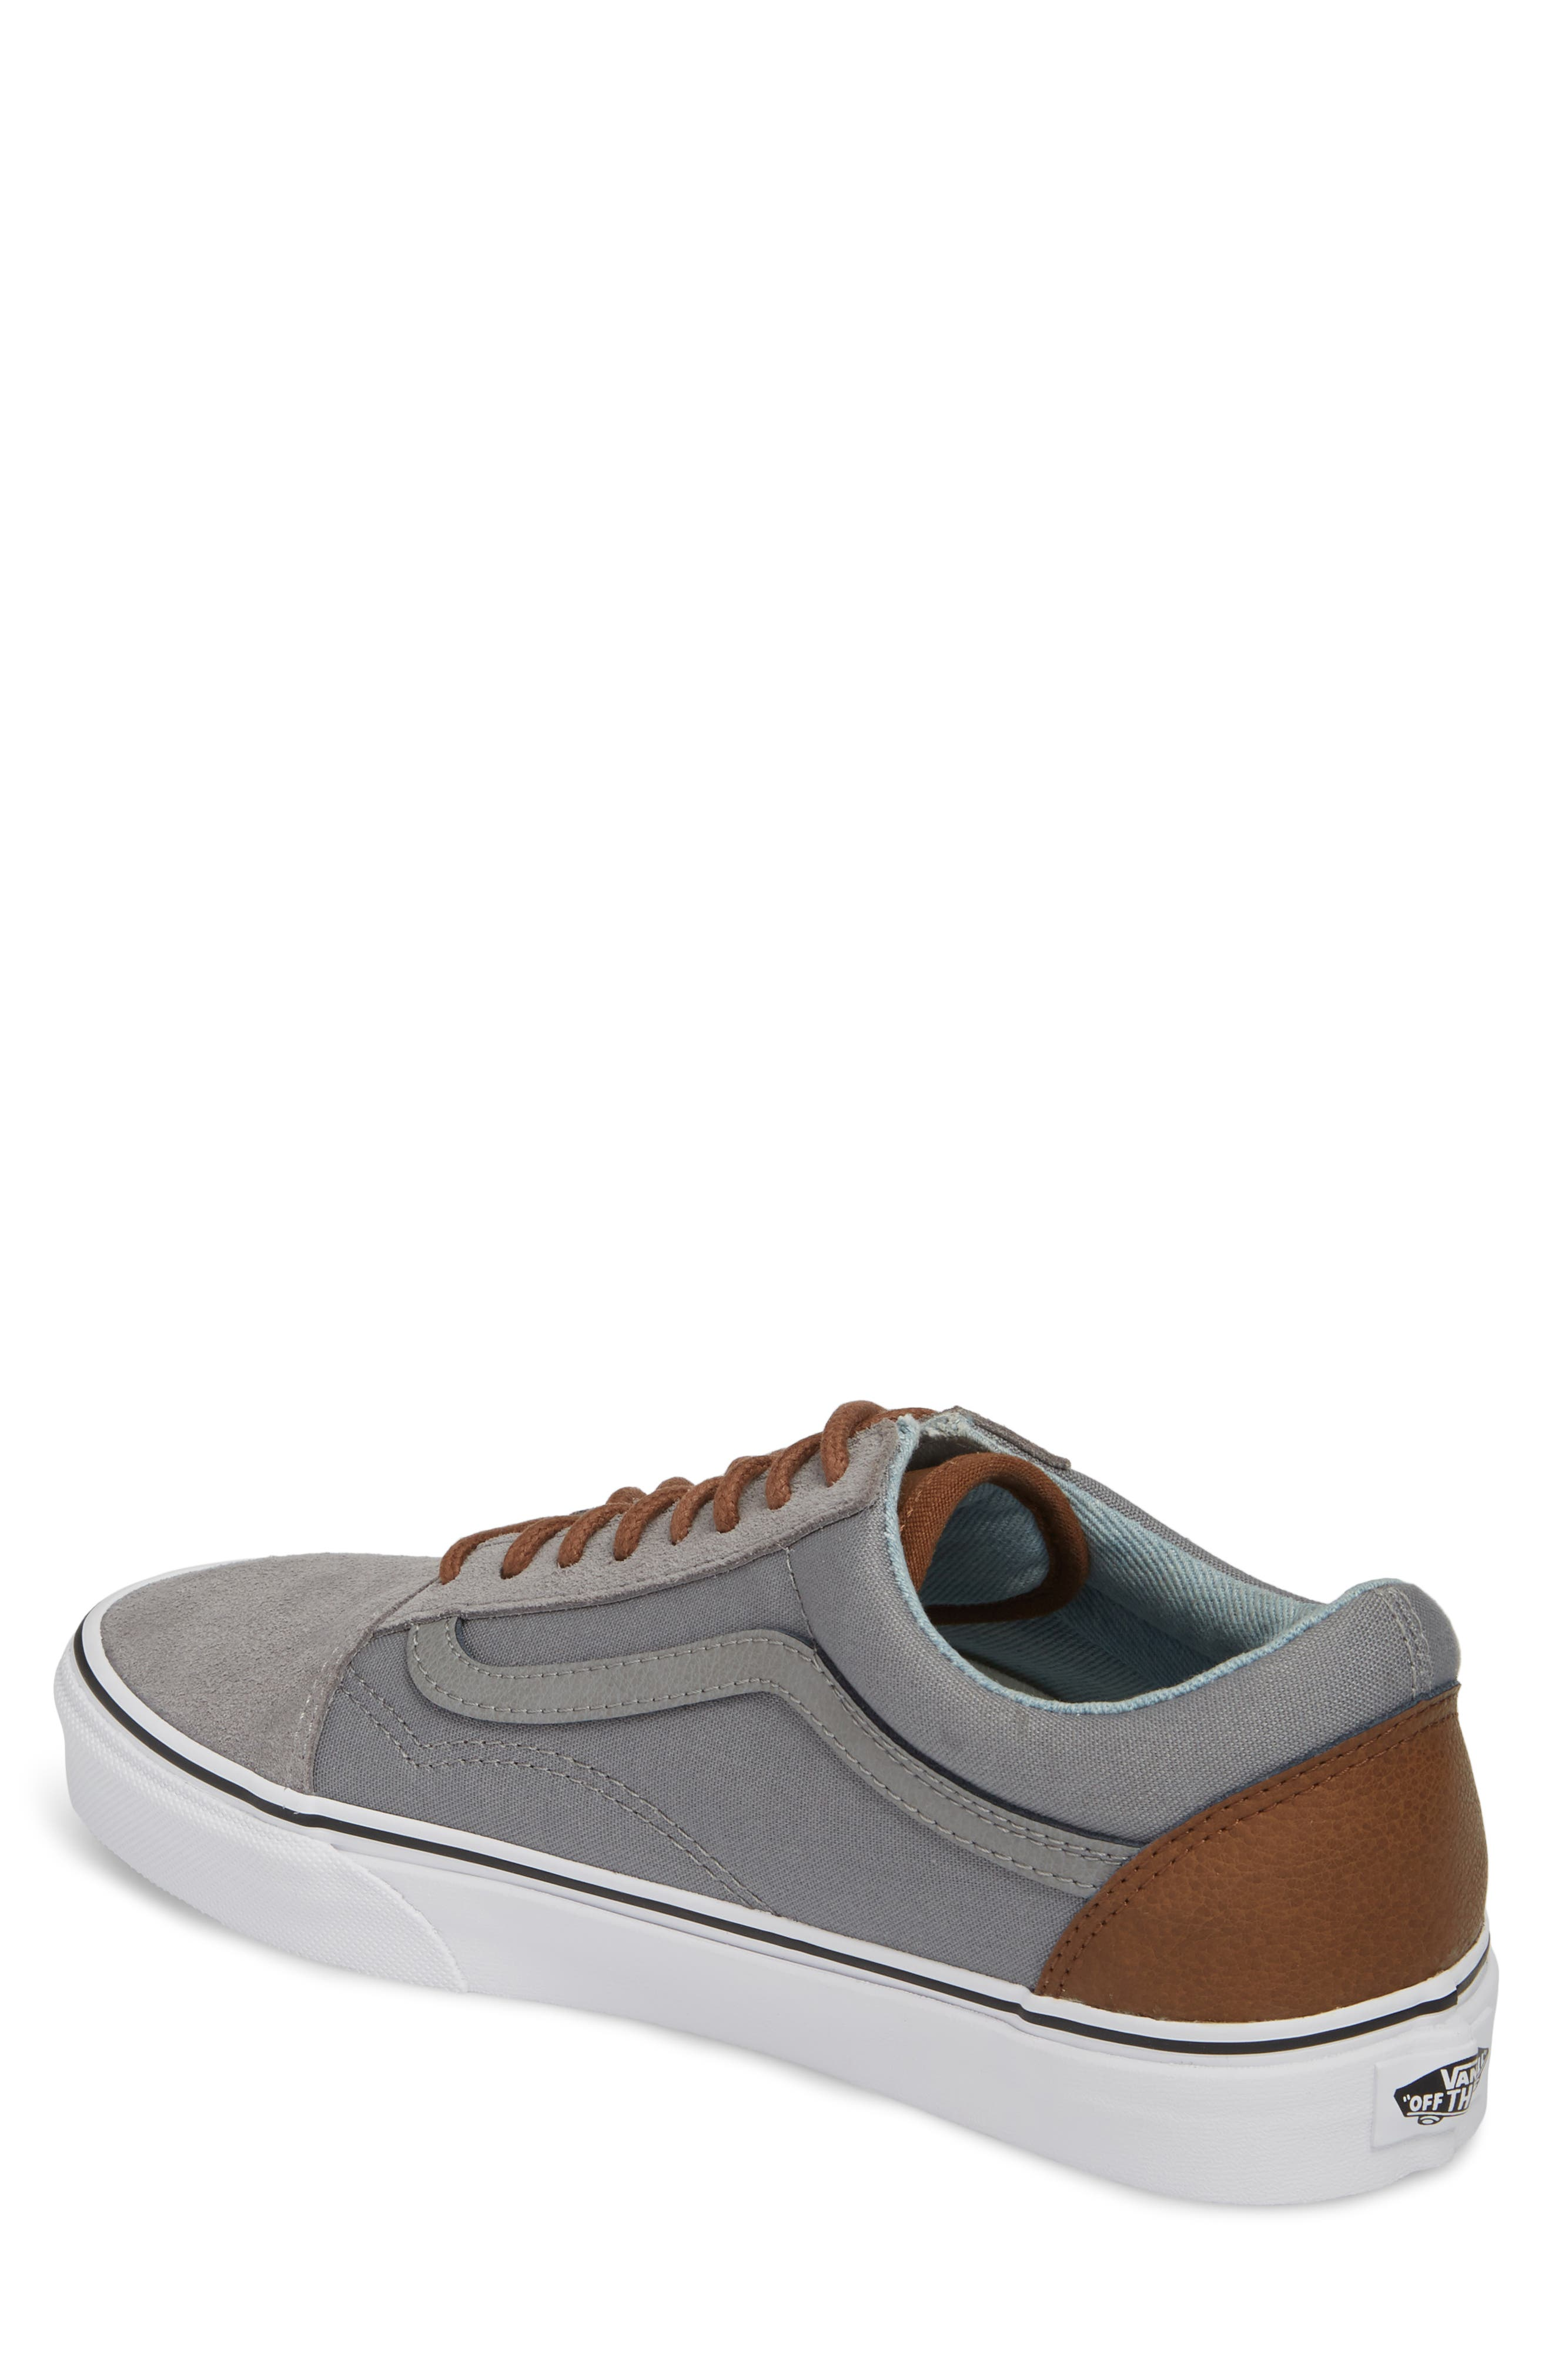 Old Skool Low Top Sneaker,                             Alternate thumbnail 2, color,                             Frost Grey/ Acid Denim Leather